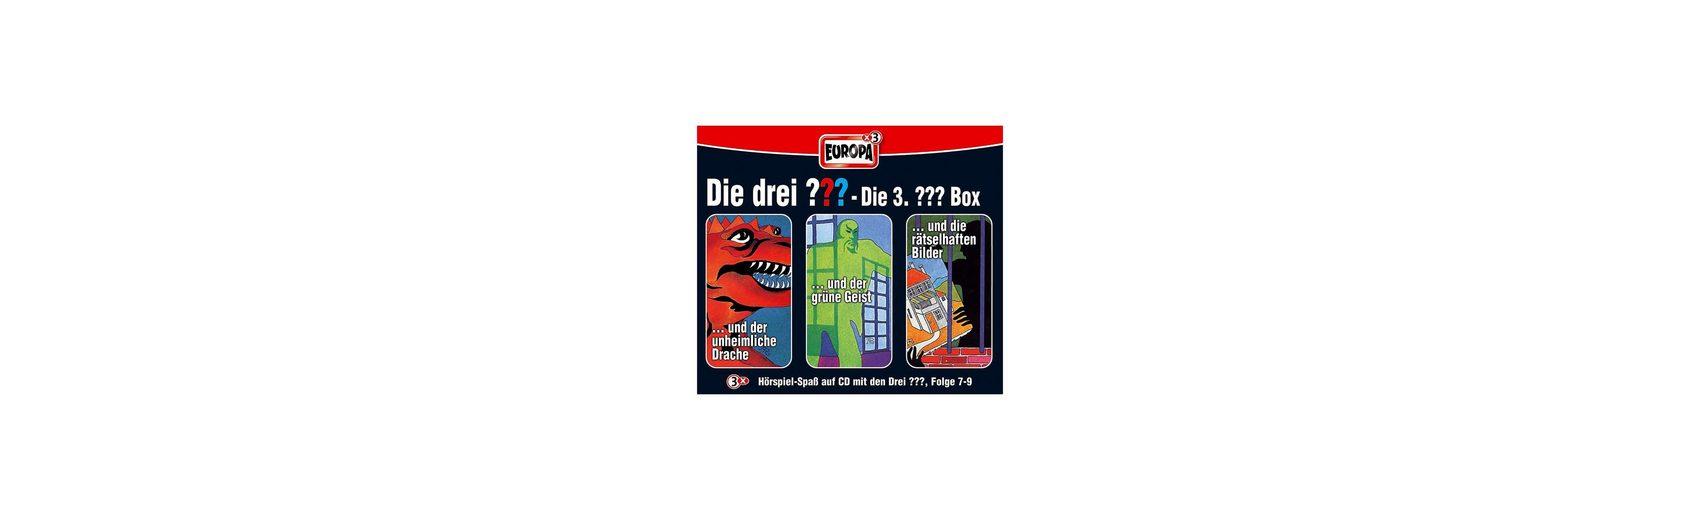 SONY BMG MUSIC CD Die drei ??? 007-009: Box (Folge 7 - 9)